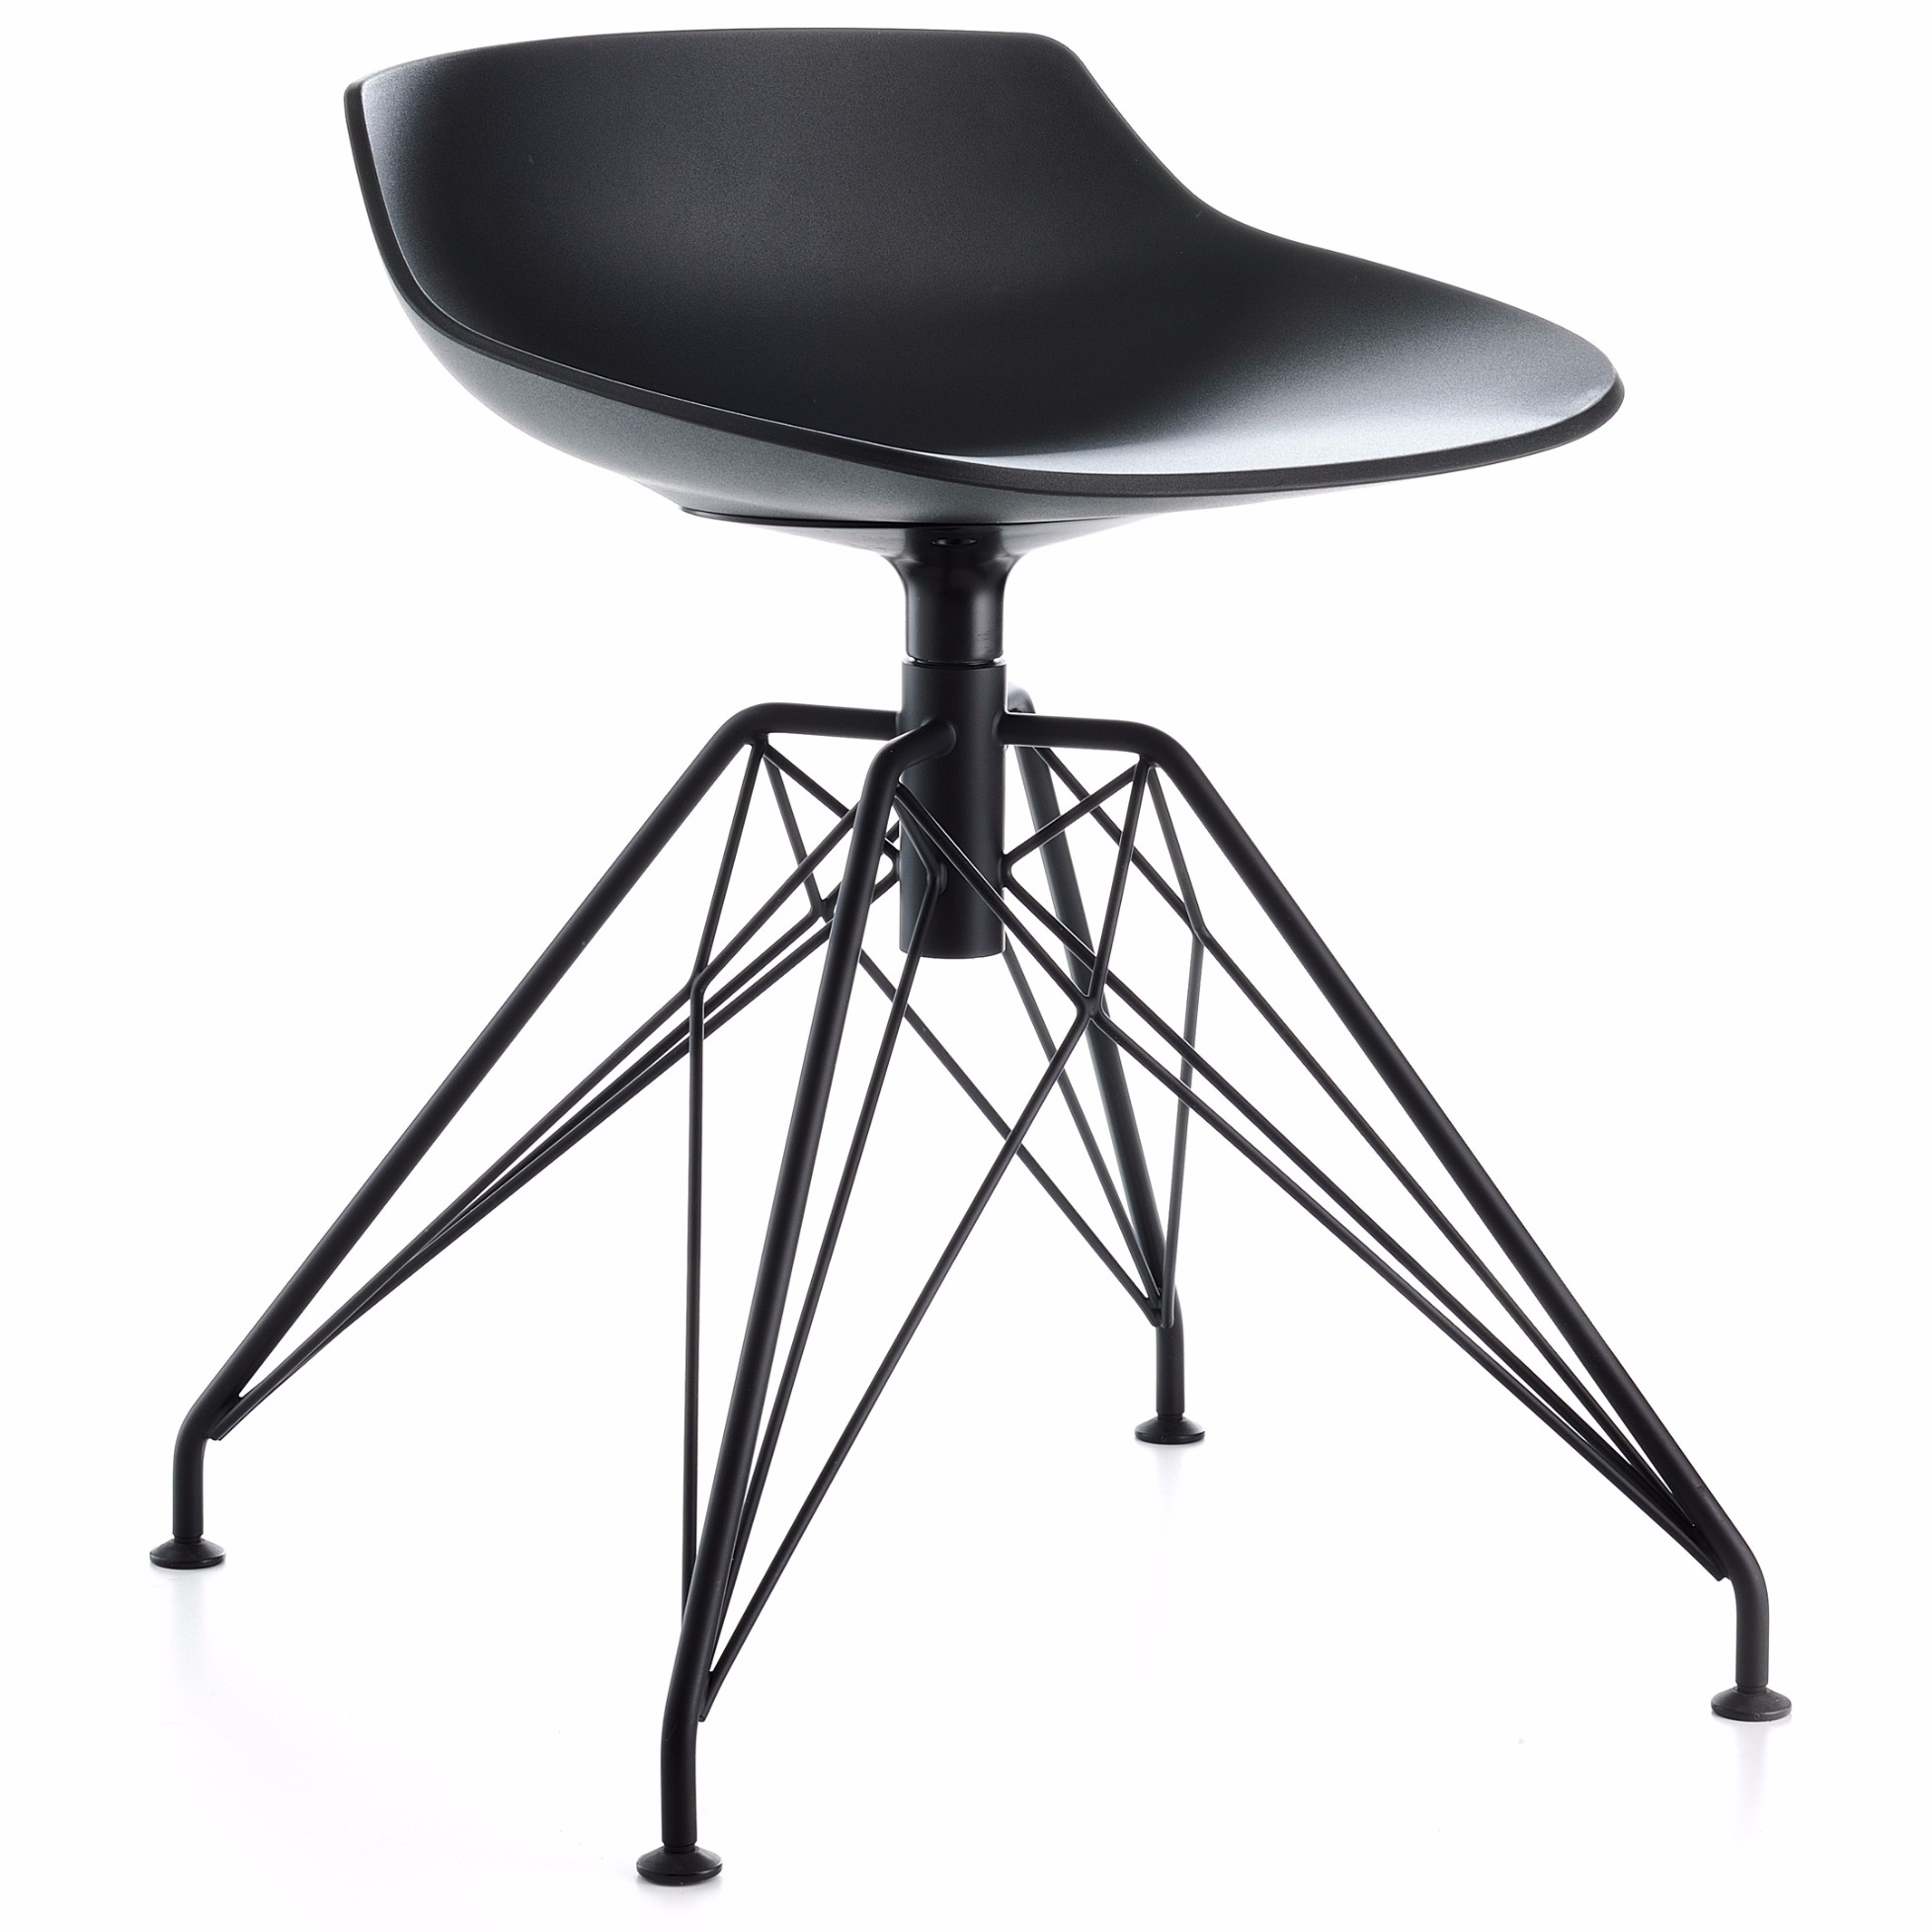 Flow stool mit lem 4 fu gestell von mdf italia - Tabouret de bar quatre pieds ...